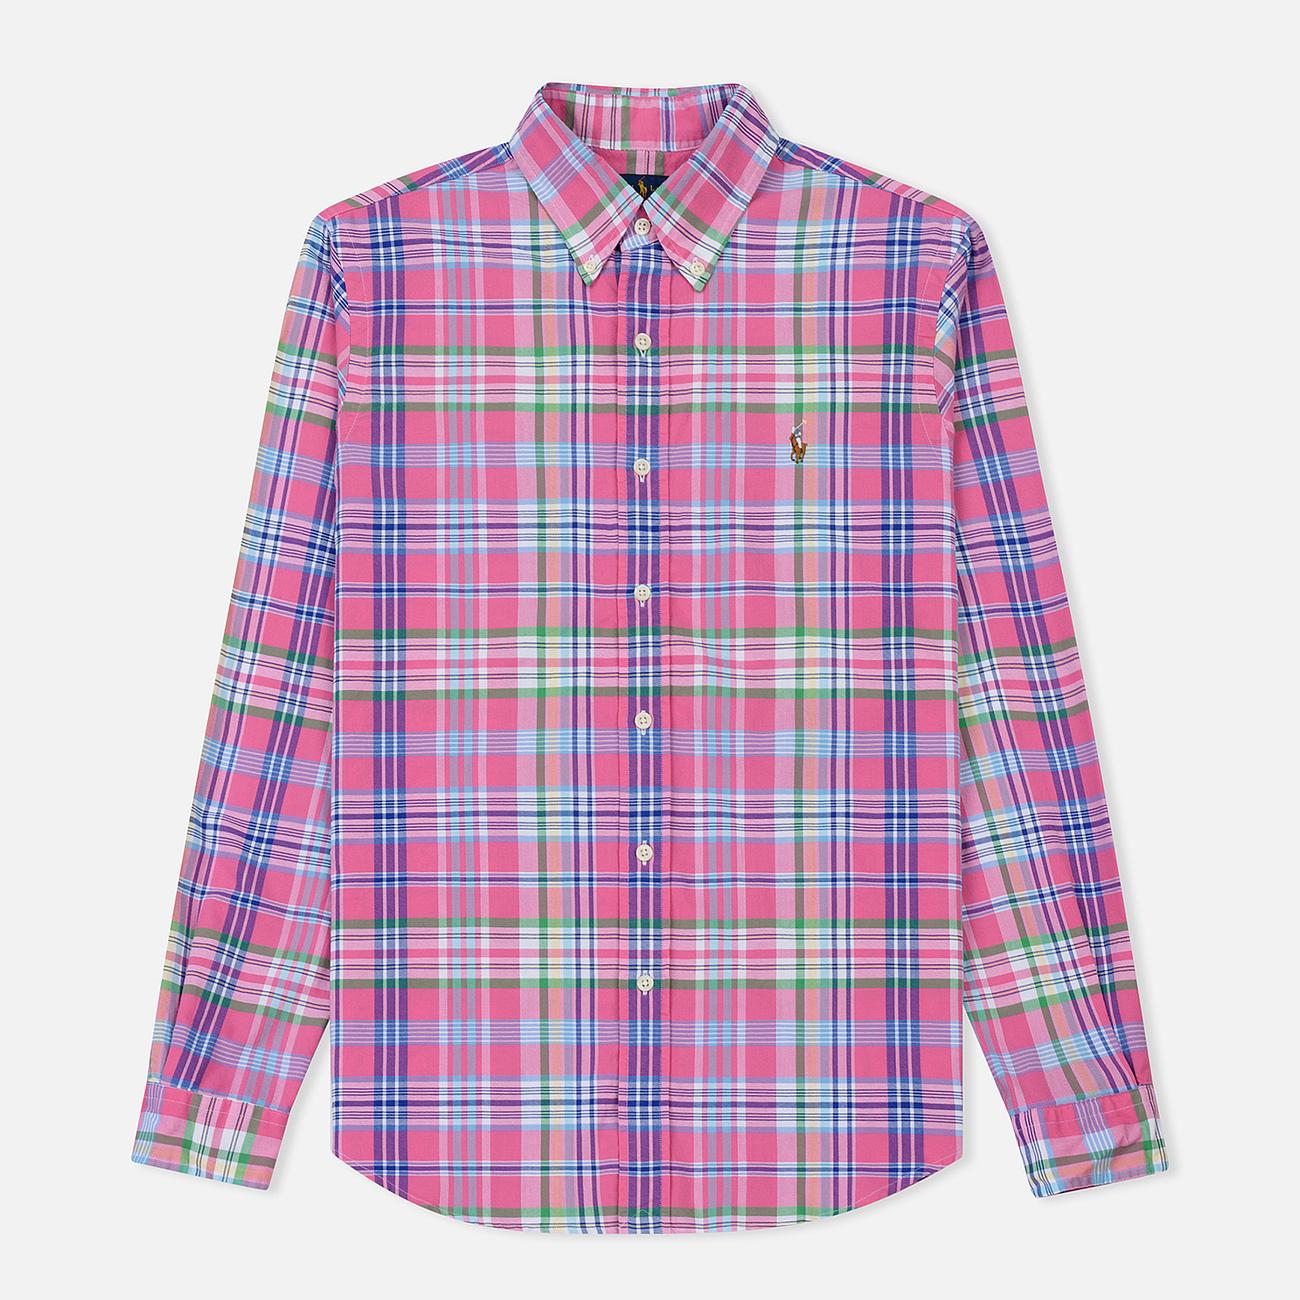 Мужская рубашка Polo Ralph Lauren Oxford Plaid Horizon Pink/Blue Multi